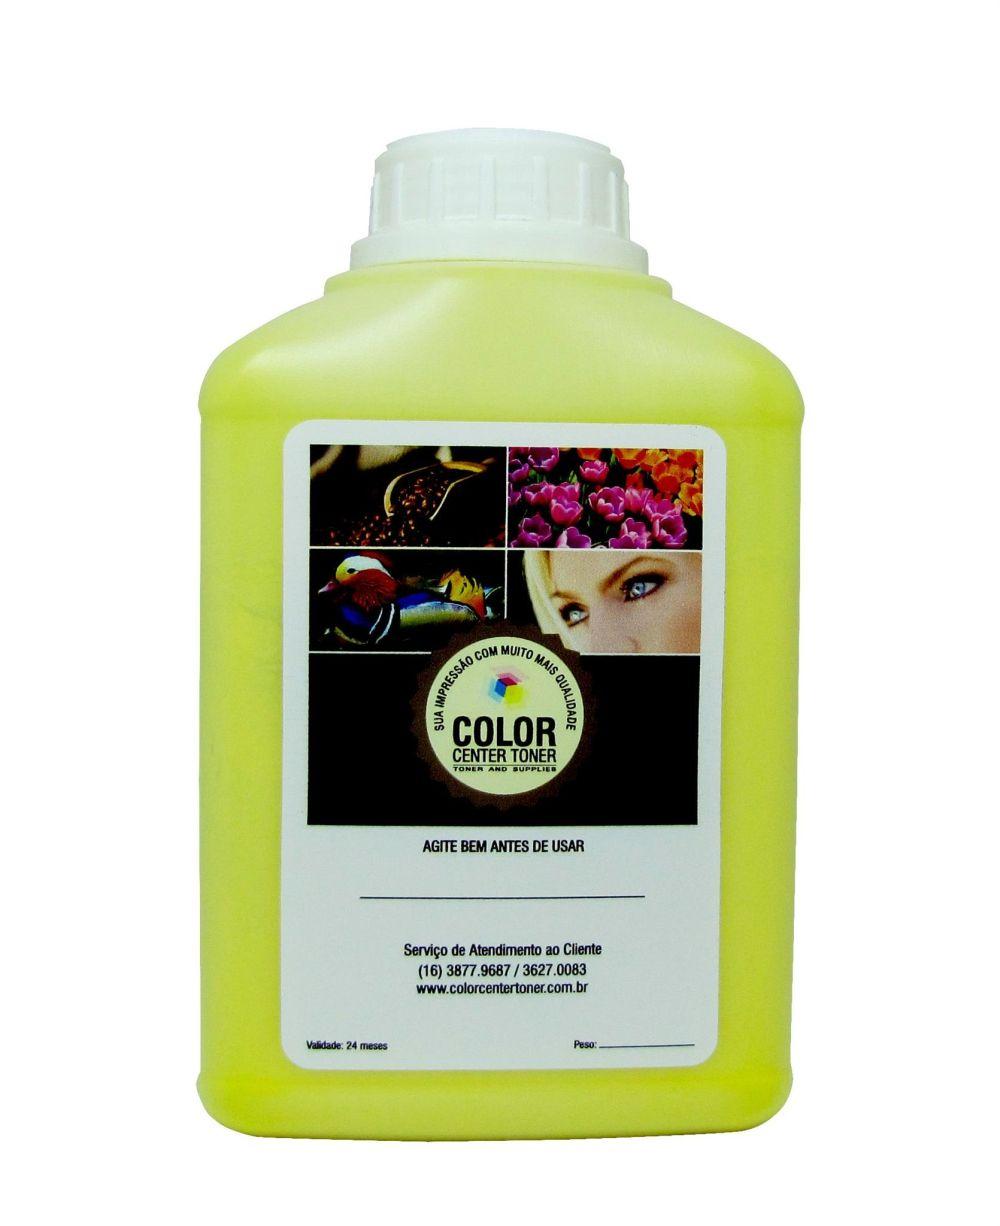 Refil de Toner Okidata C330/331 Amarelo